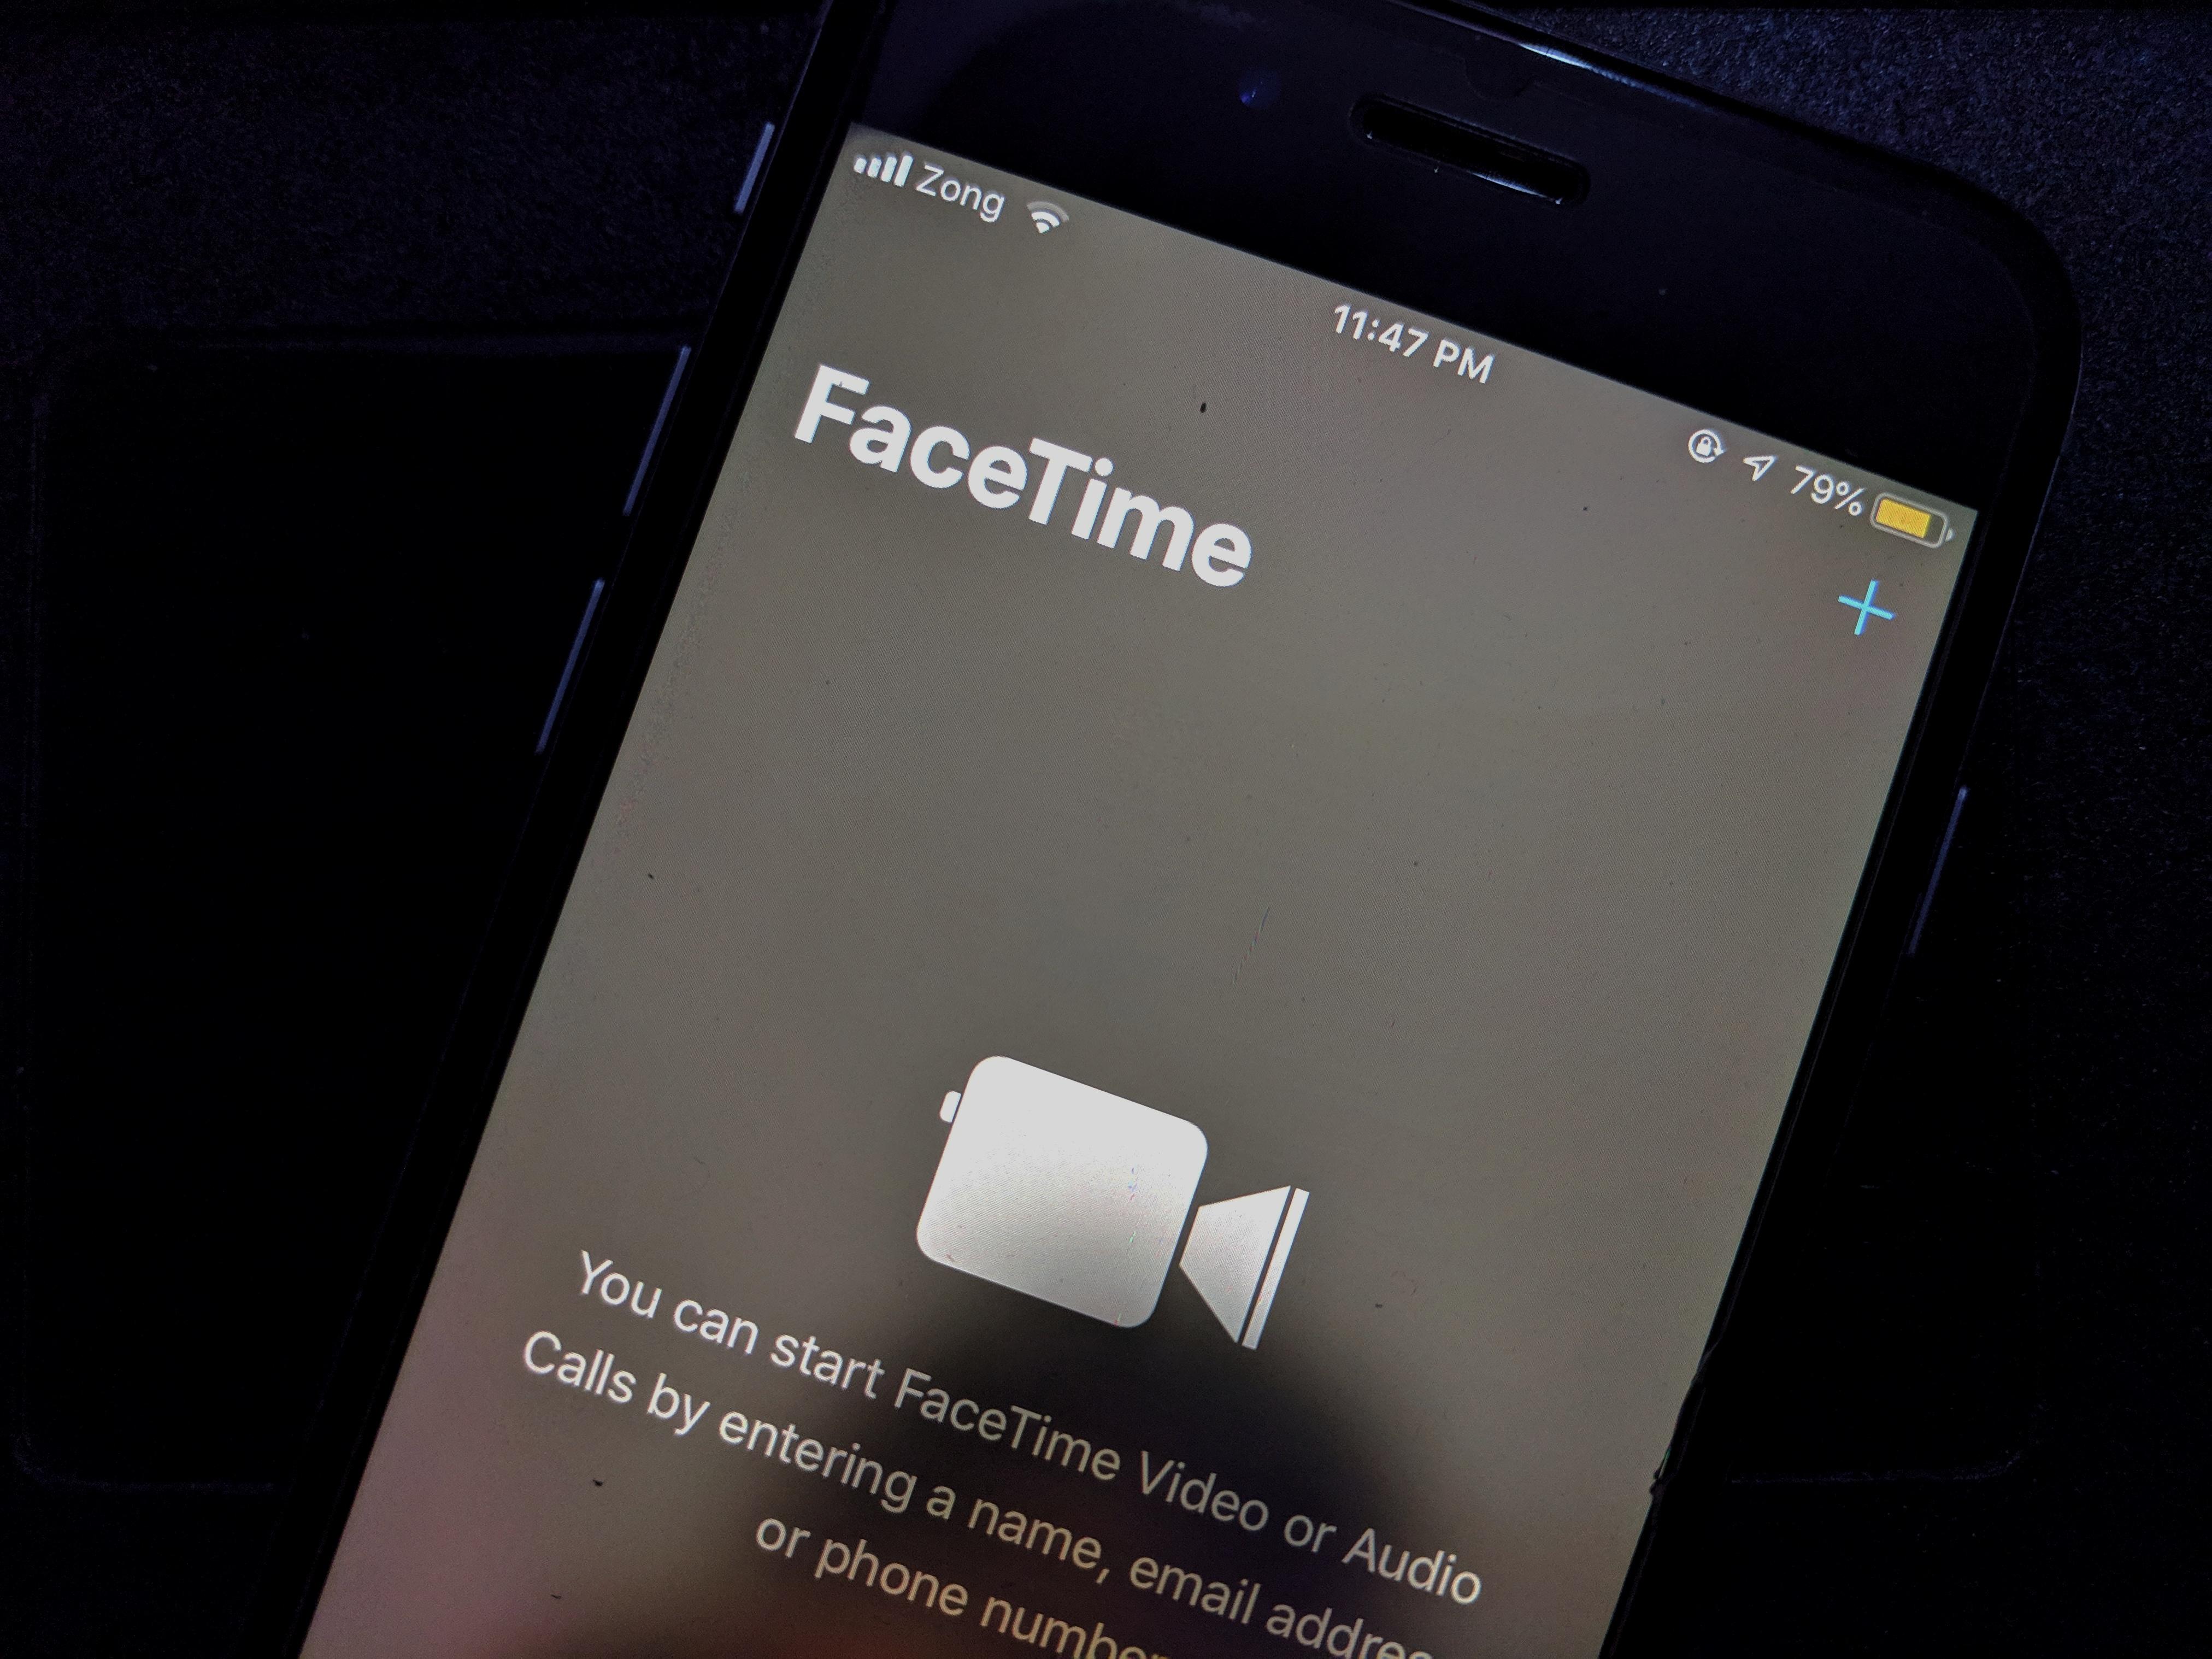 Facetime bug lets caller hear audio before call